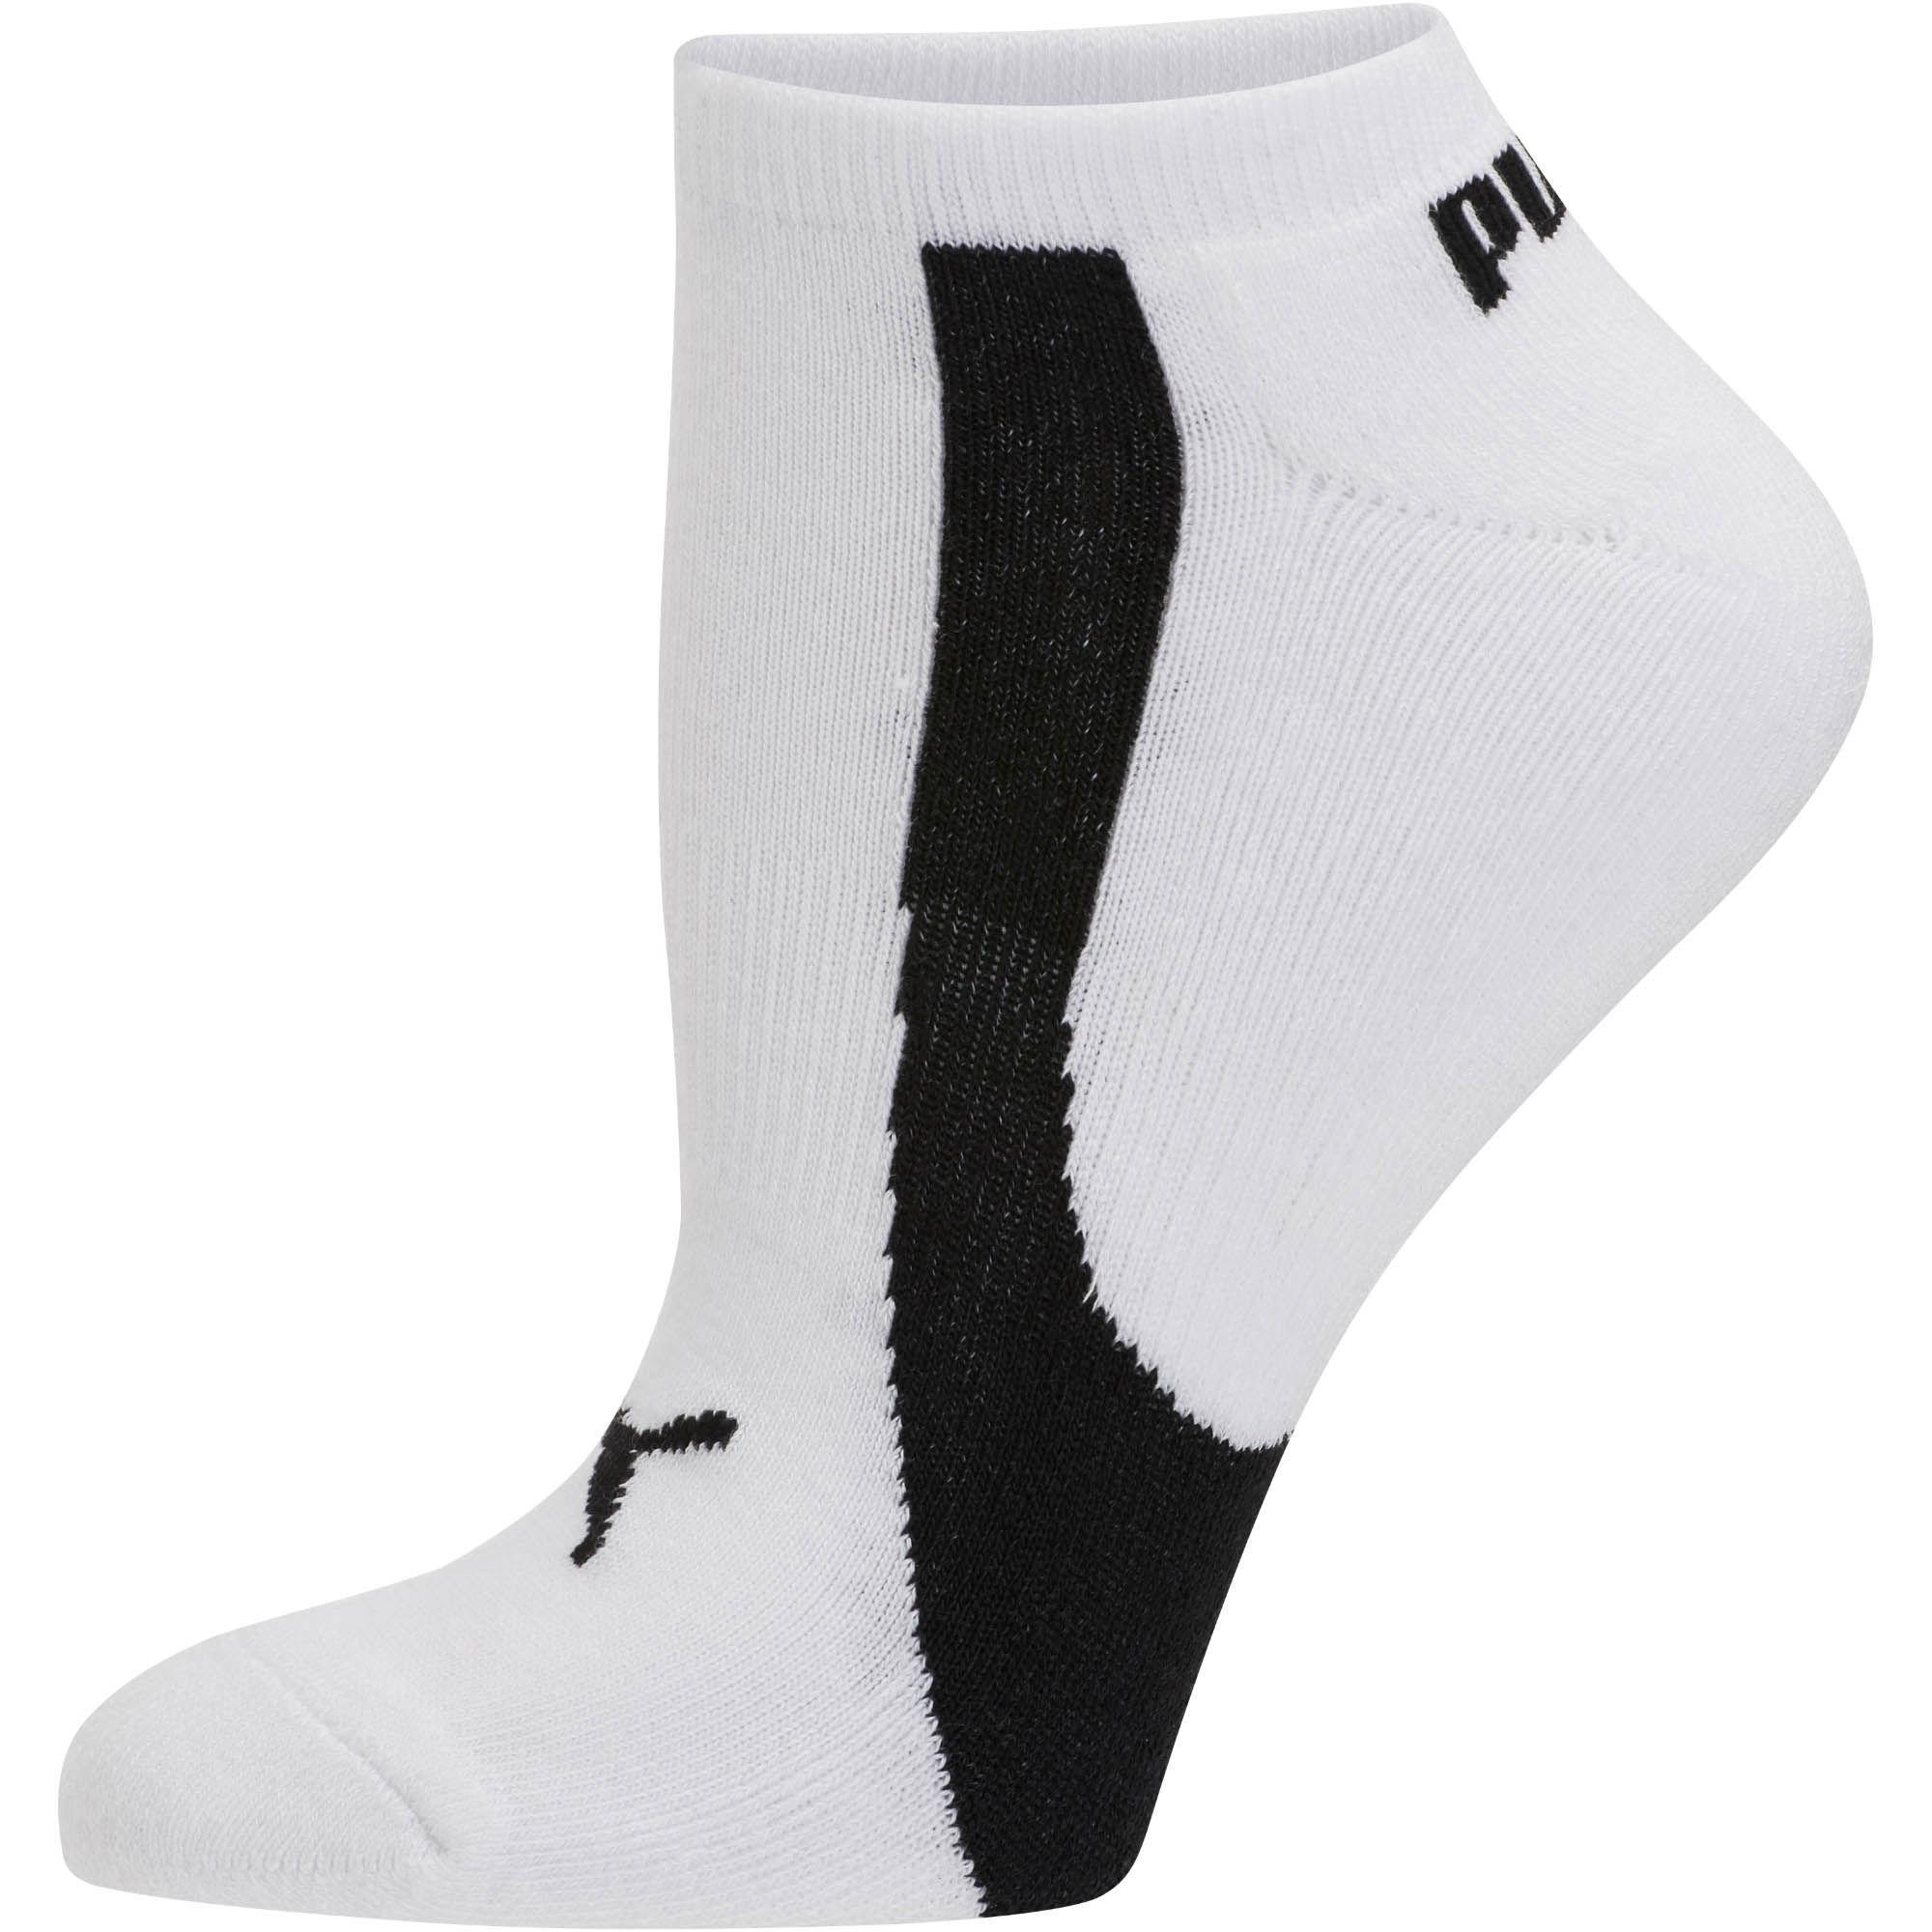 ba0b2600d8e9 Lyst - Puma Bamboo Women s No Show Socks (3 Pack) in Black